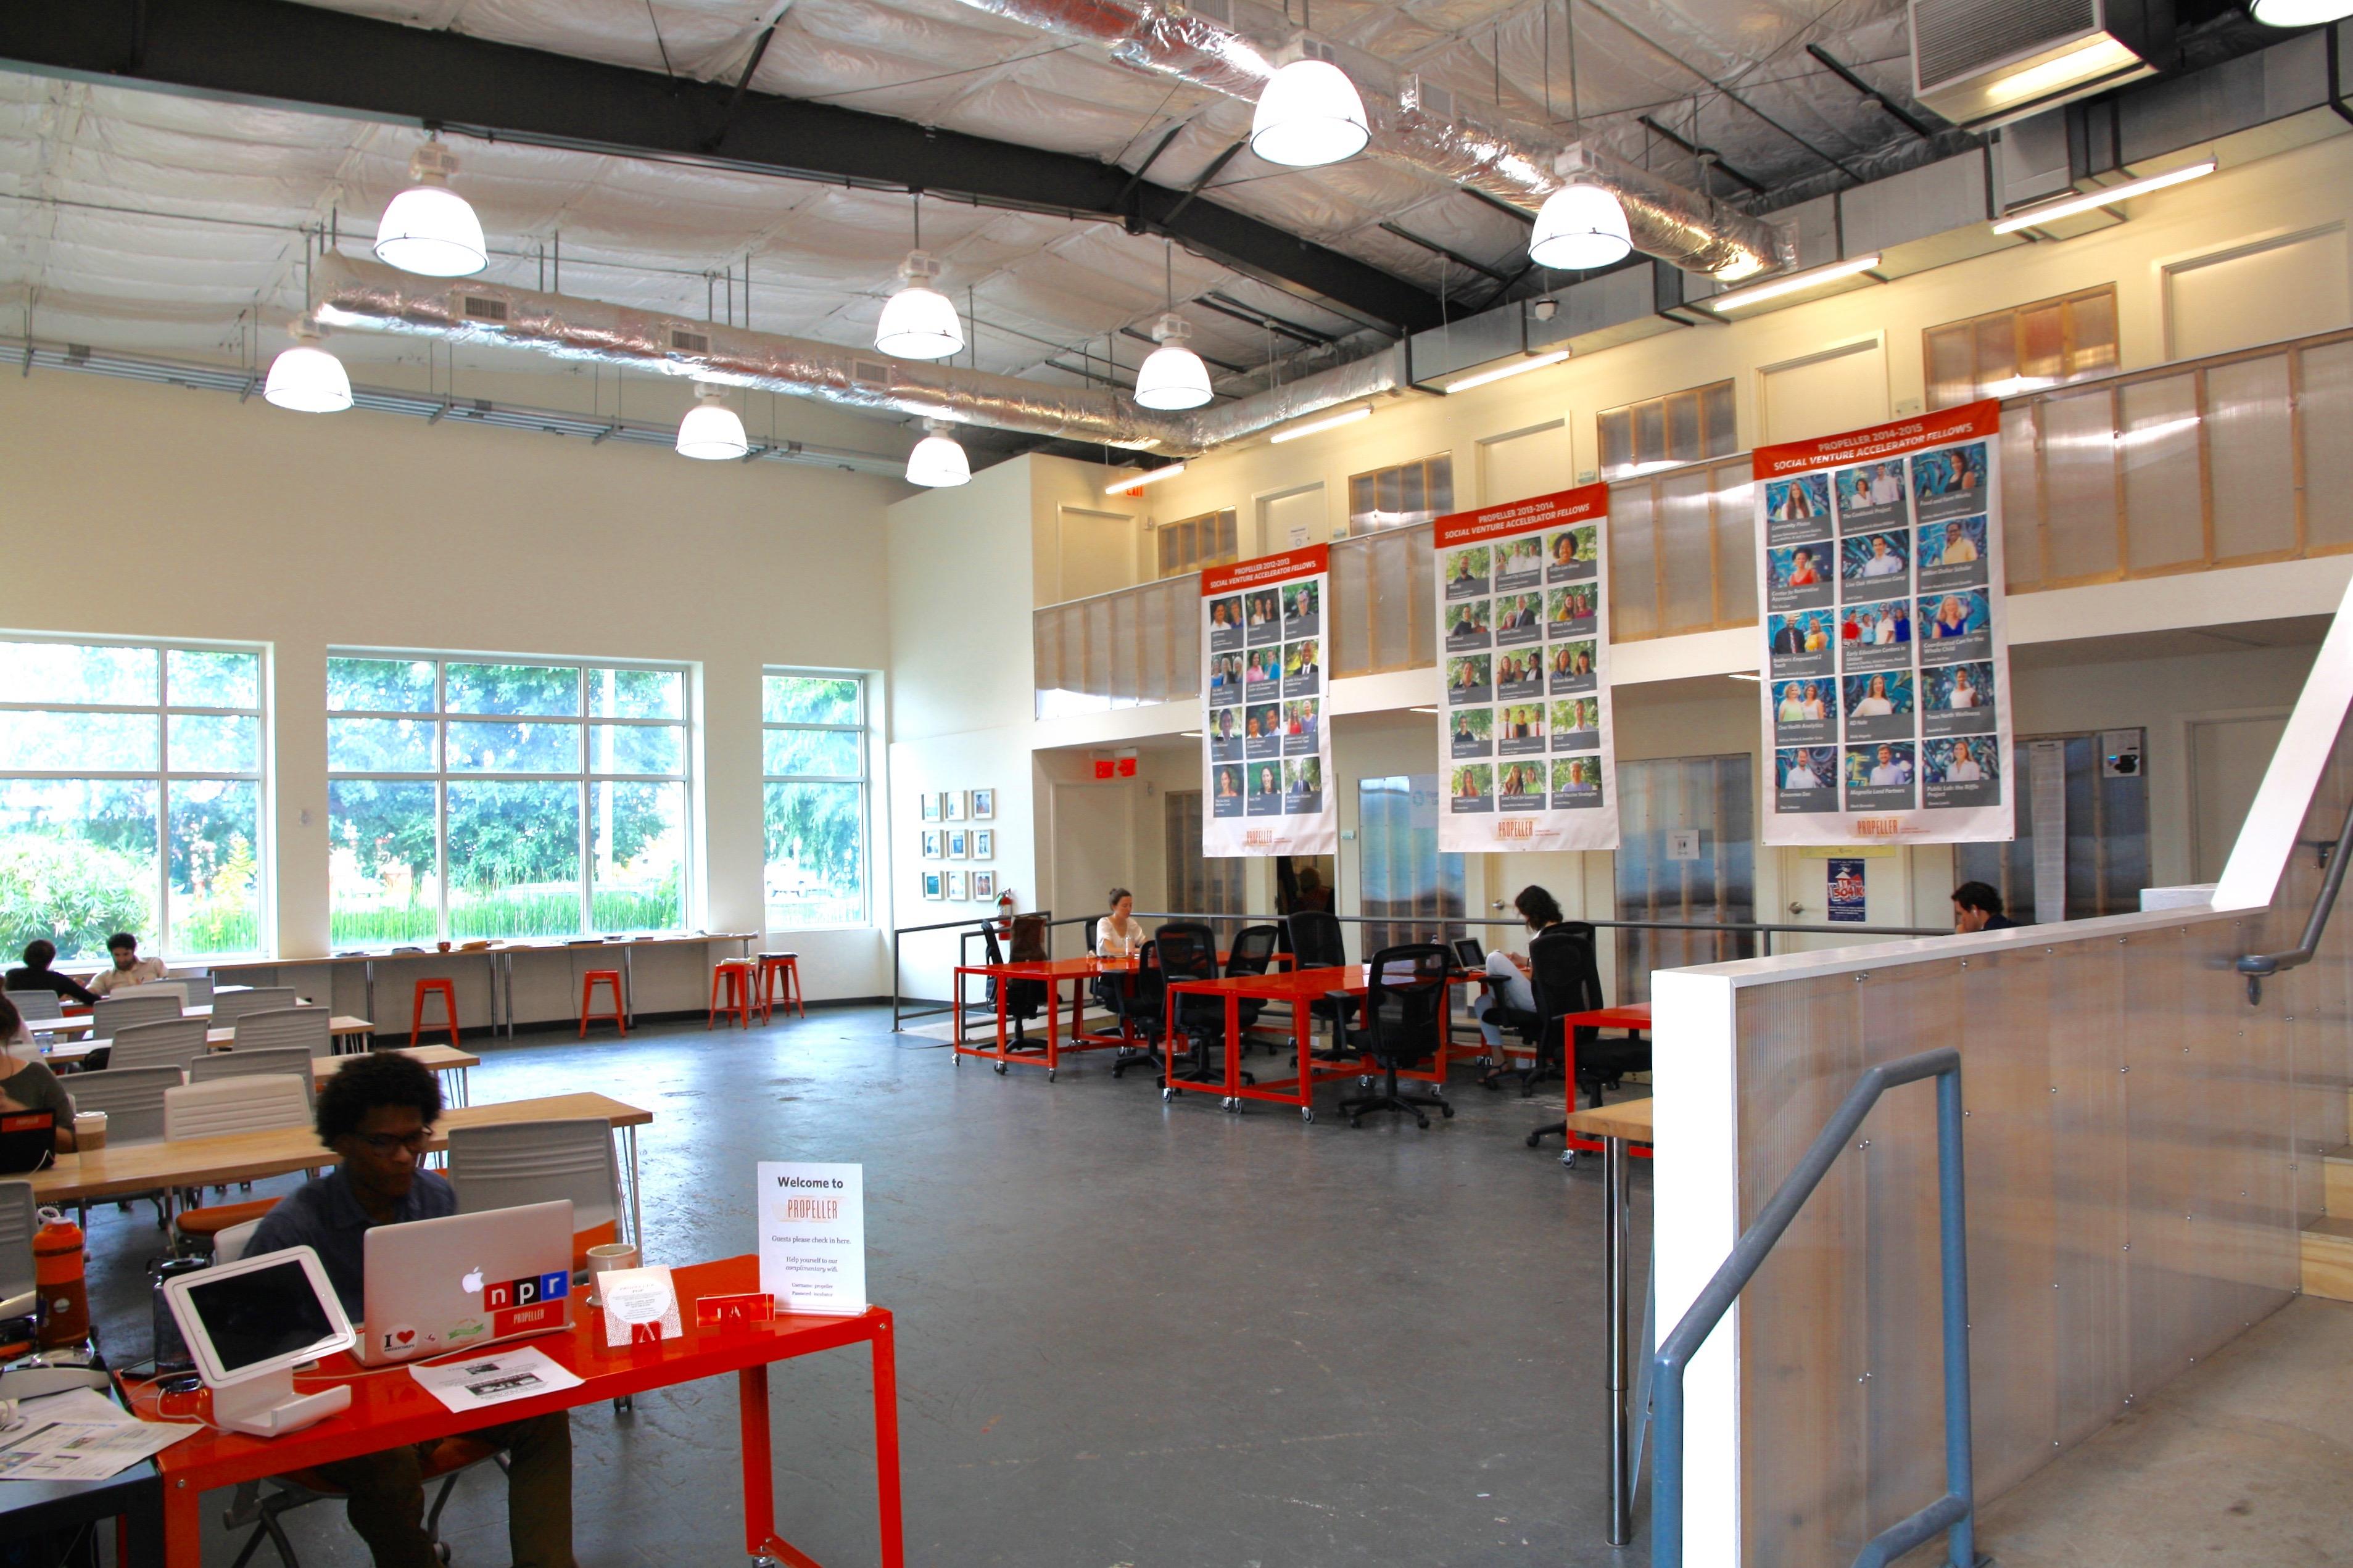 Propeller - coworking spaces in new orleans